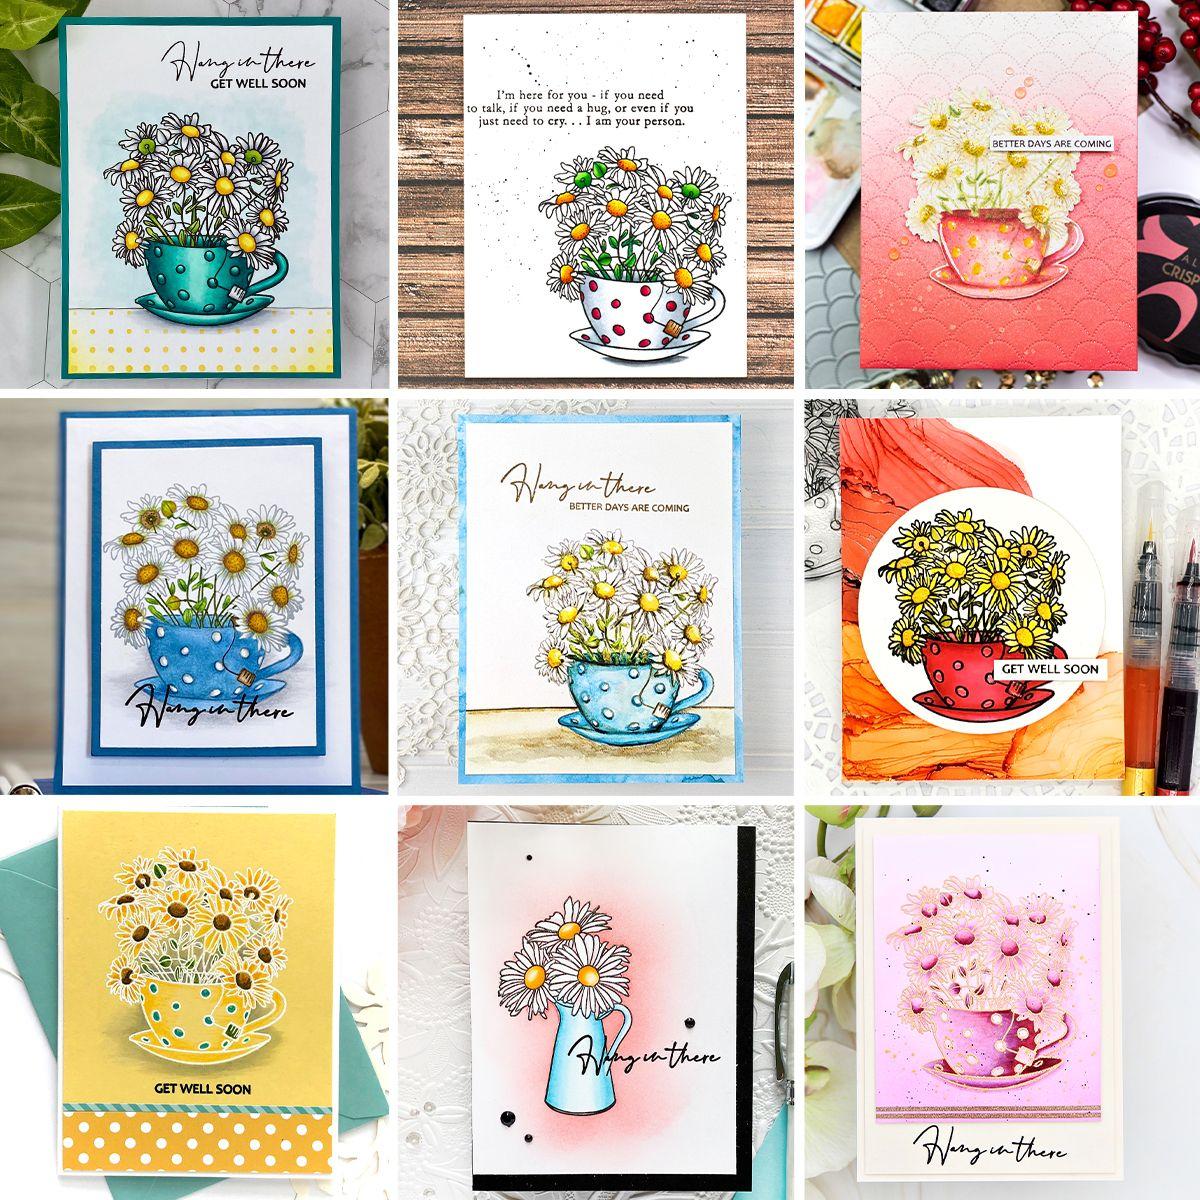 Paint-A-Flower: Chamomile Stamp Set Release Blog Hop + Giveaway